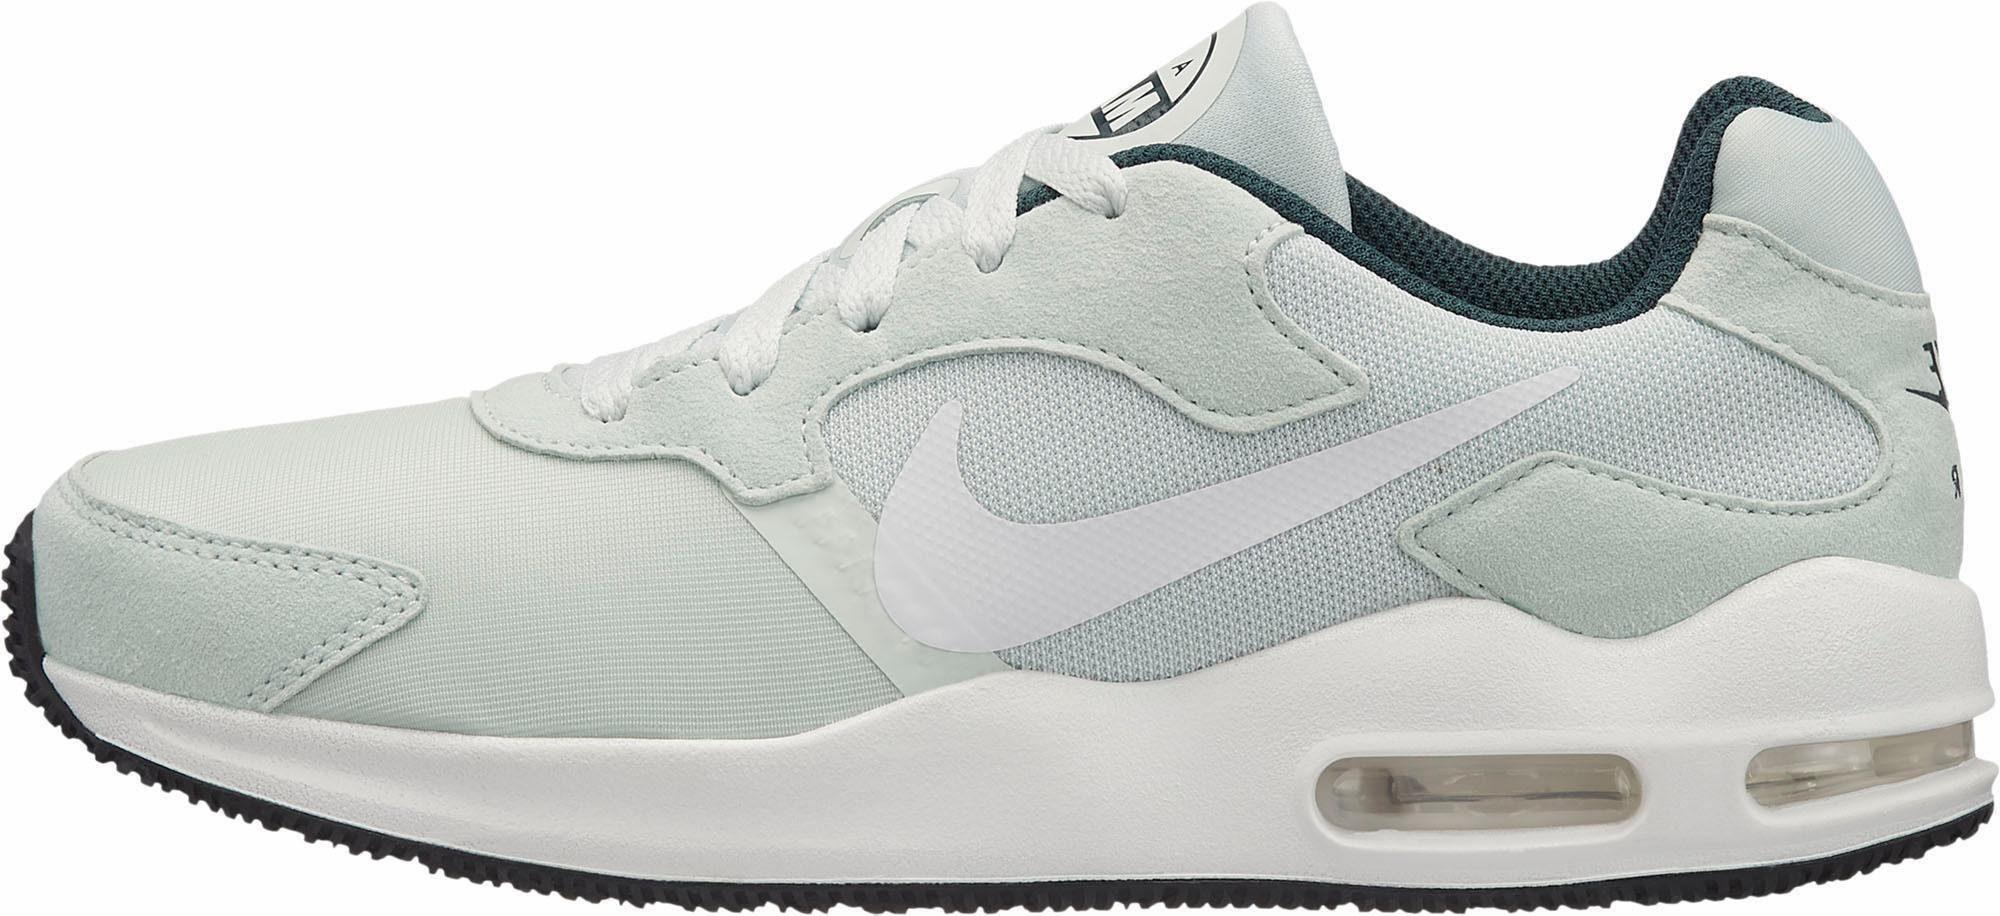 Nike Sportswear »WMNS AIR MAX GUILE W« Sneaker, Gr.38,5 (37